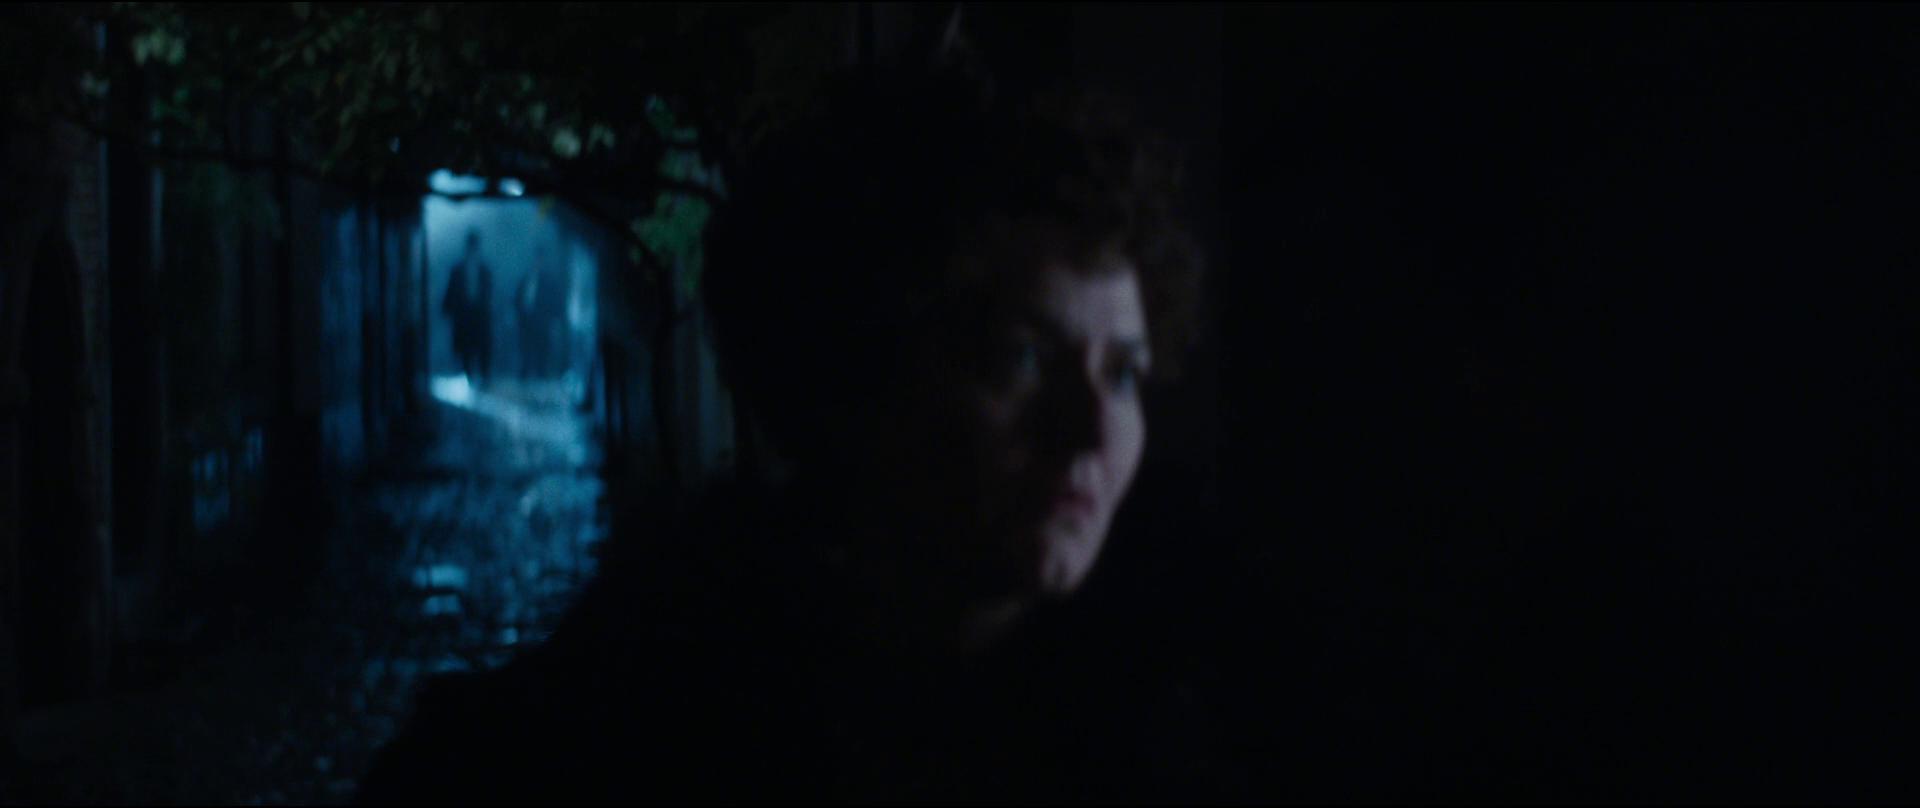 Downton Abbey 2019 BDRip X264-AMIABLE - Movies - Leak Portal